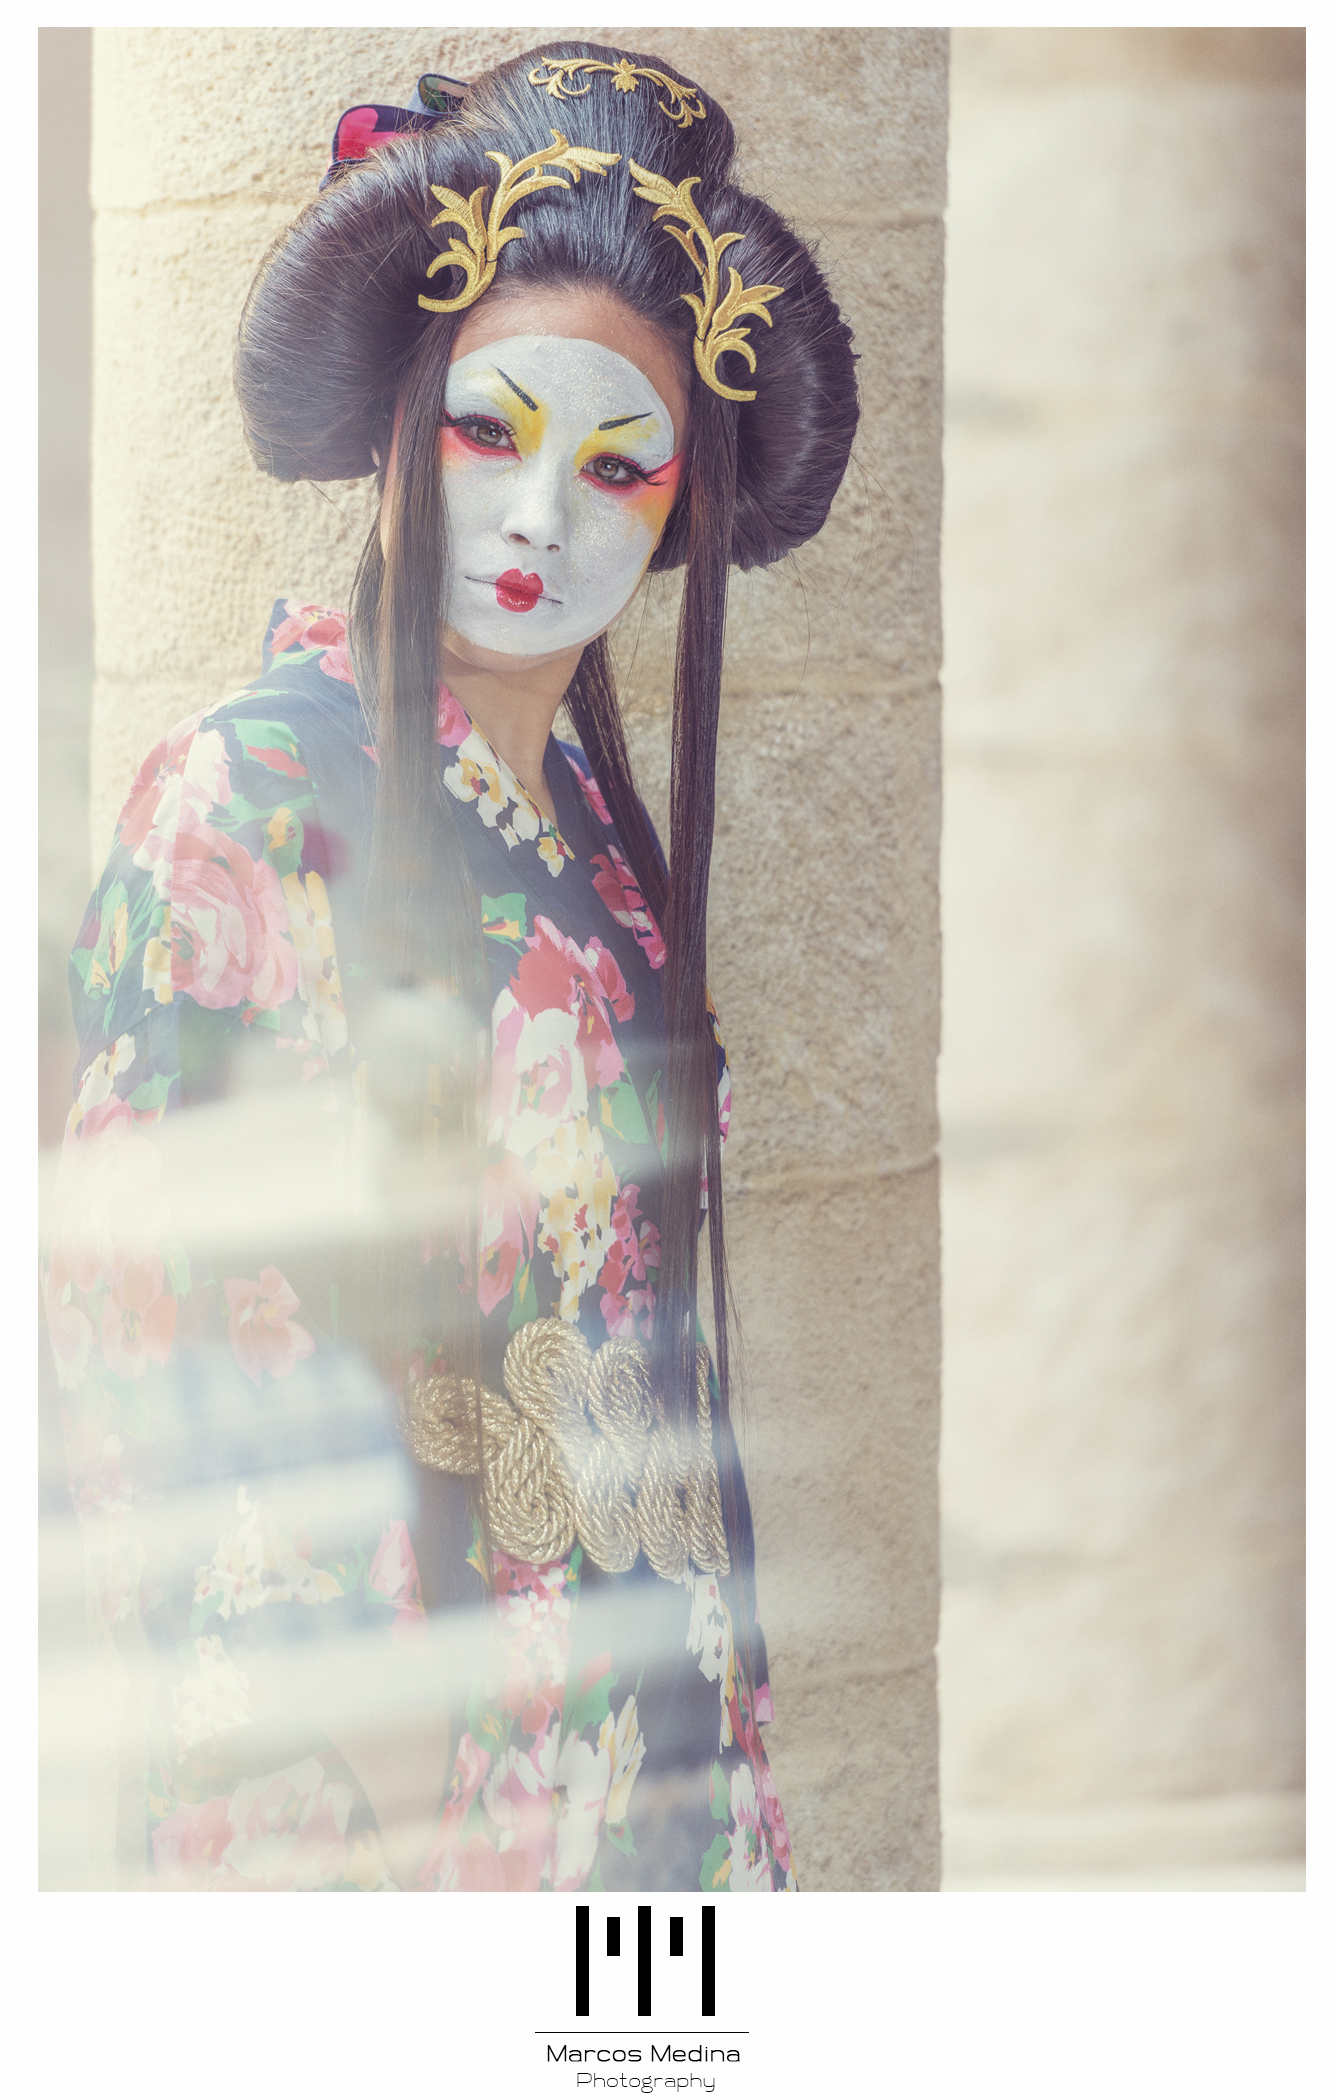 Marcos_Medina_Photography_Geisha_1